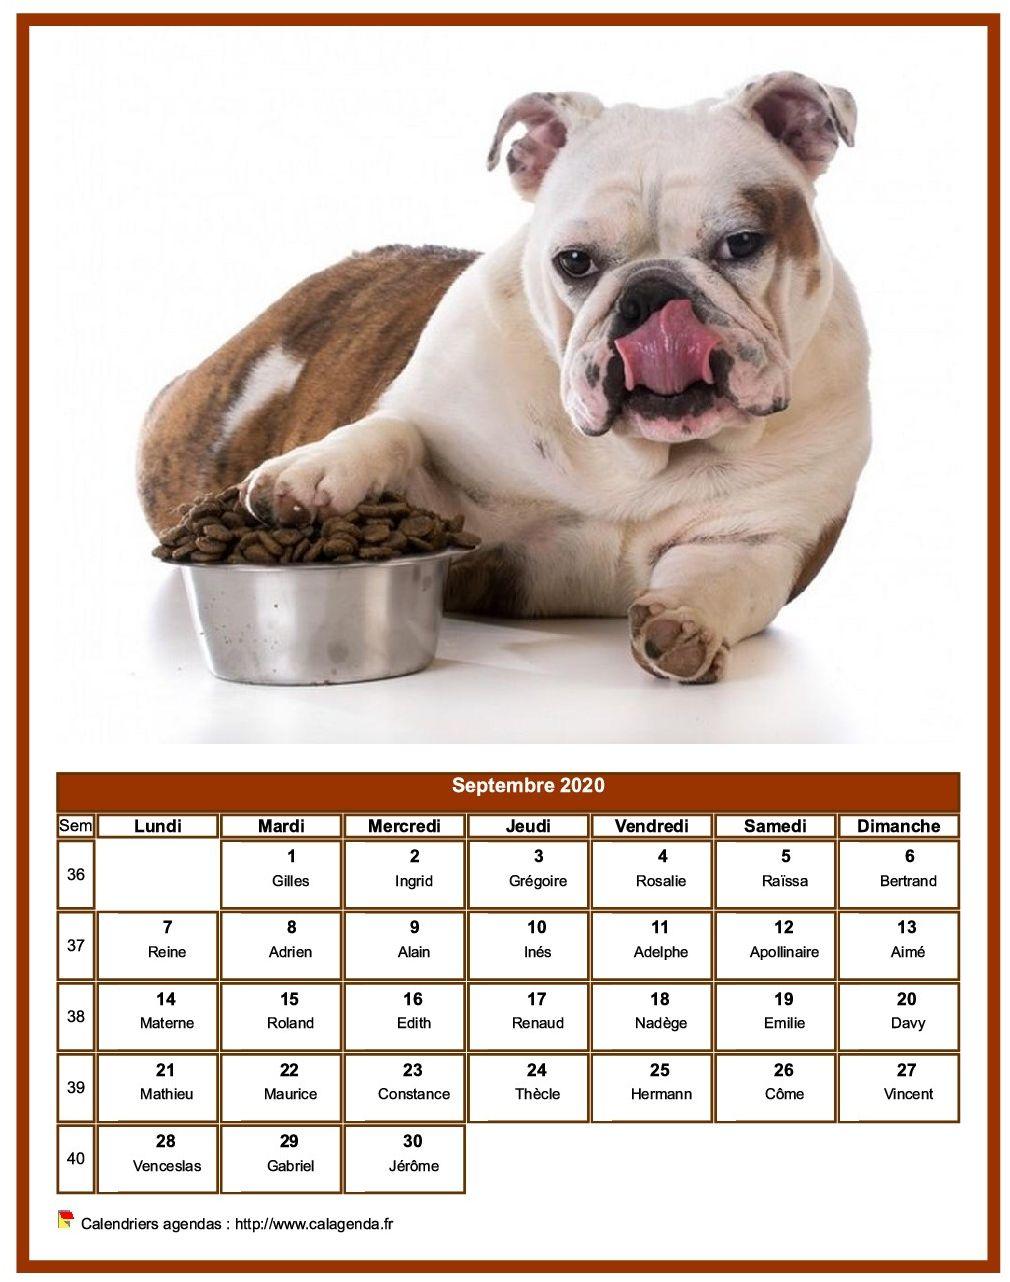 Calendrier septembre 2020 chiens